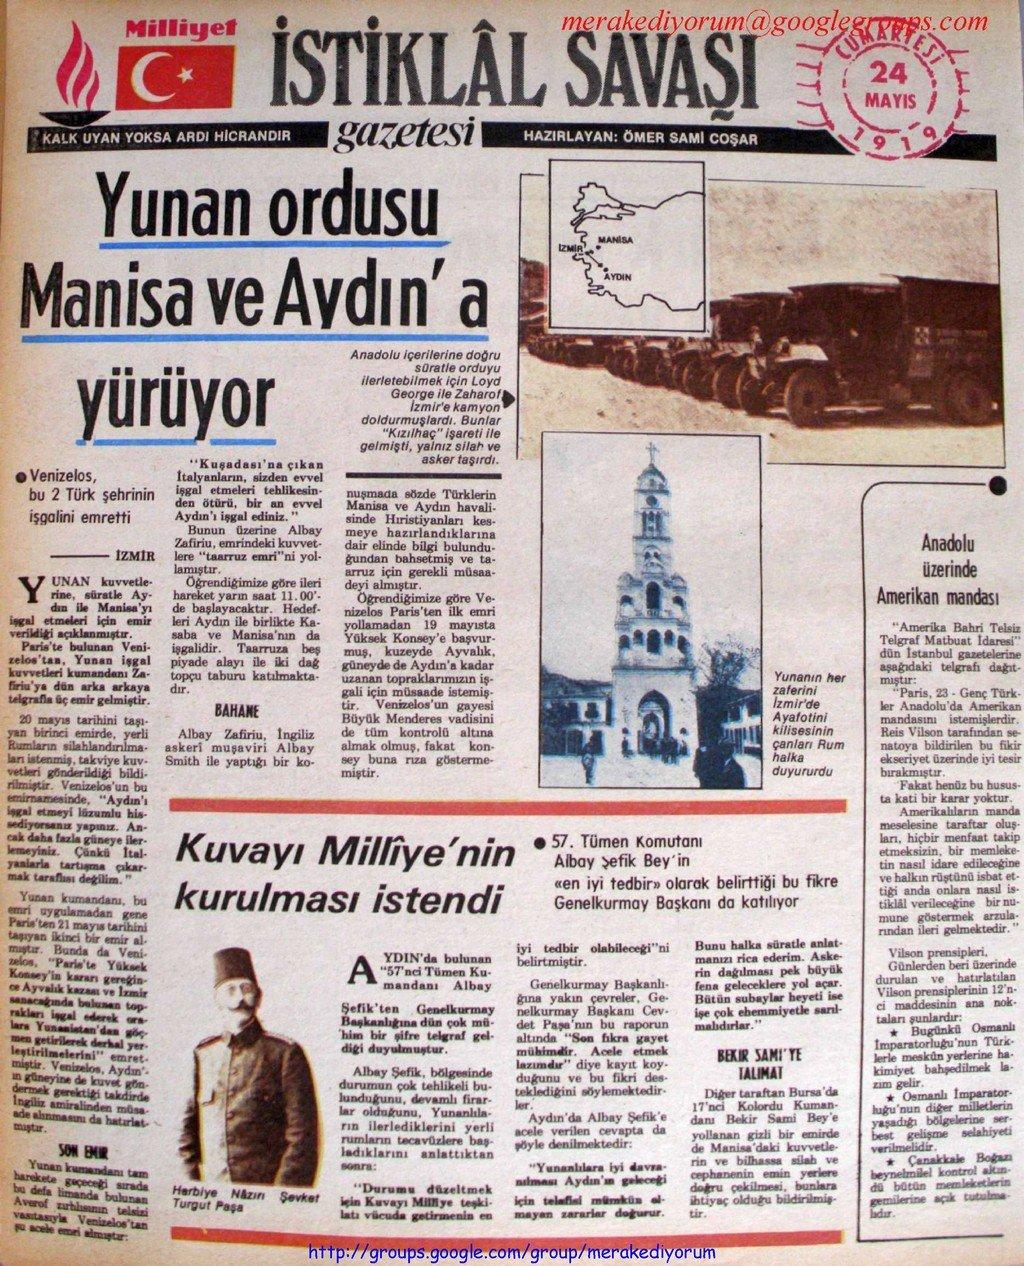 istiklal savaşı gazetesi - 24 mayıs 1919